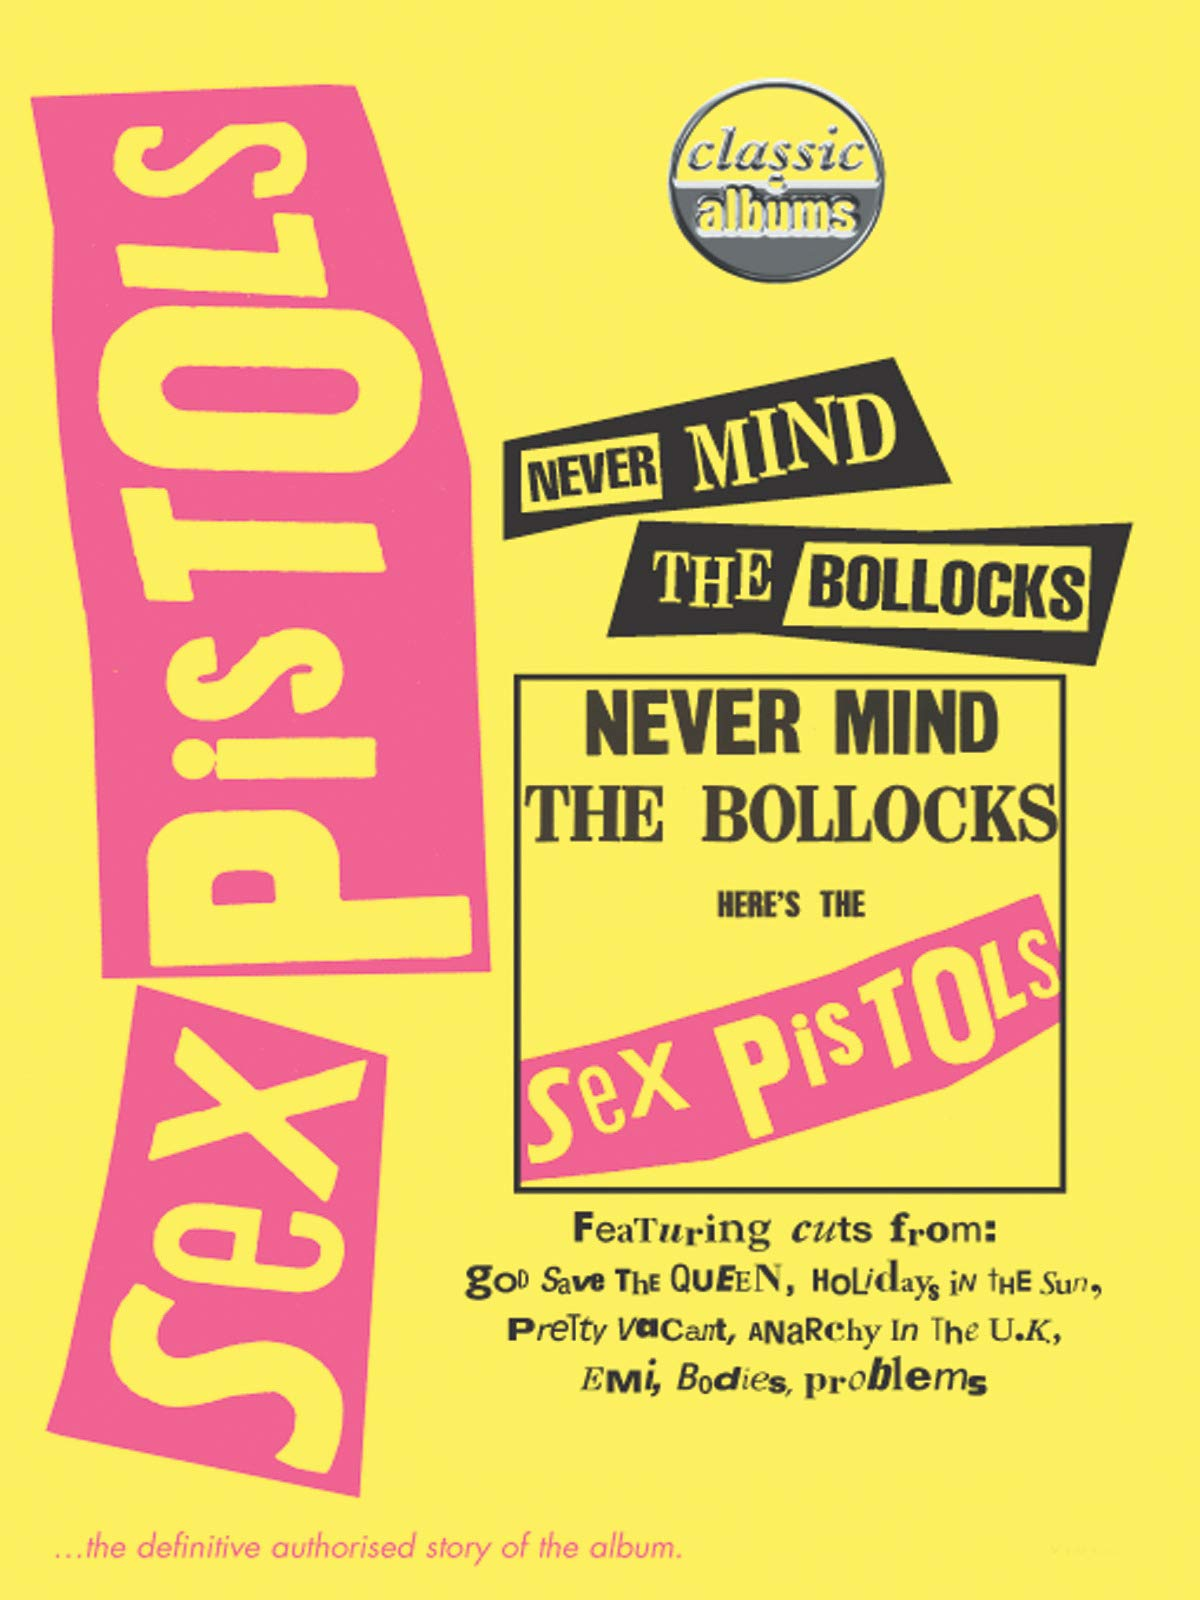 The Sex Pistols - Never Mind The Bollocks (Classic Album) on Amazon Prime Video UK